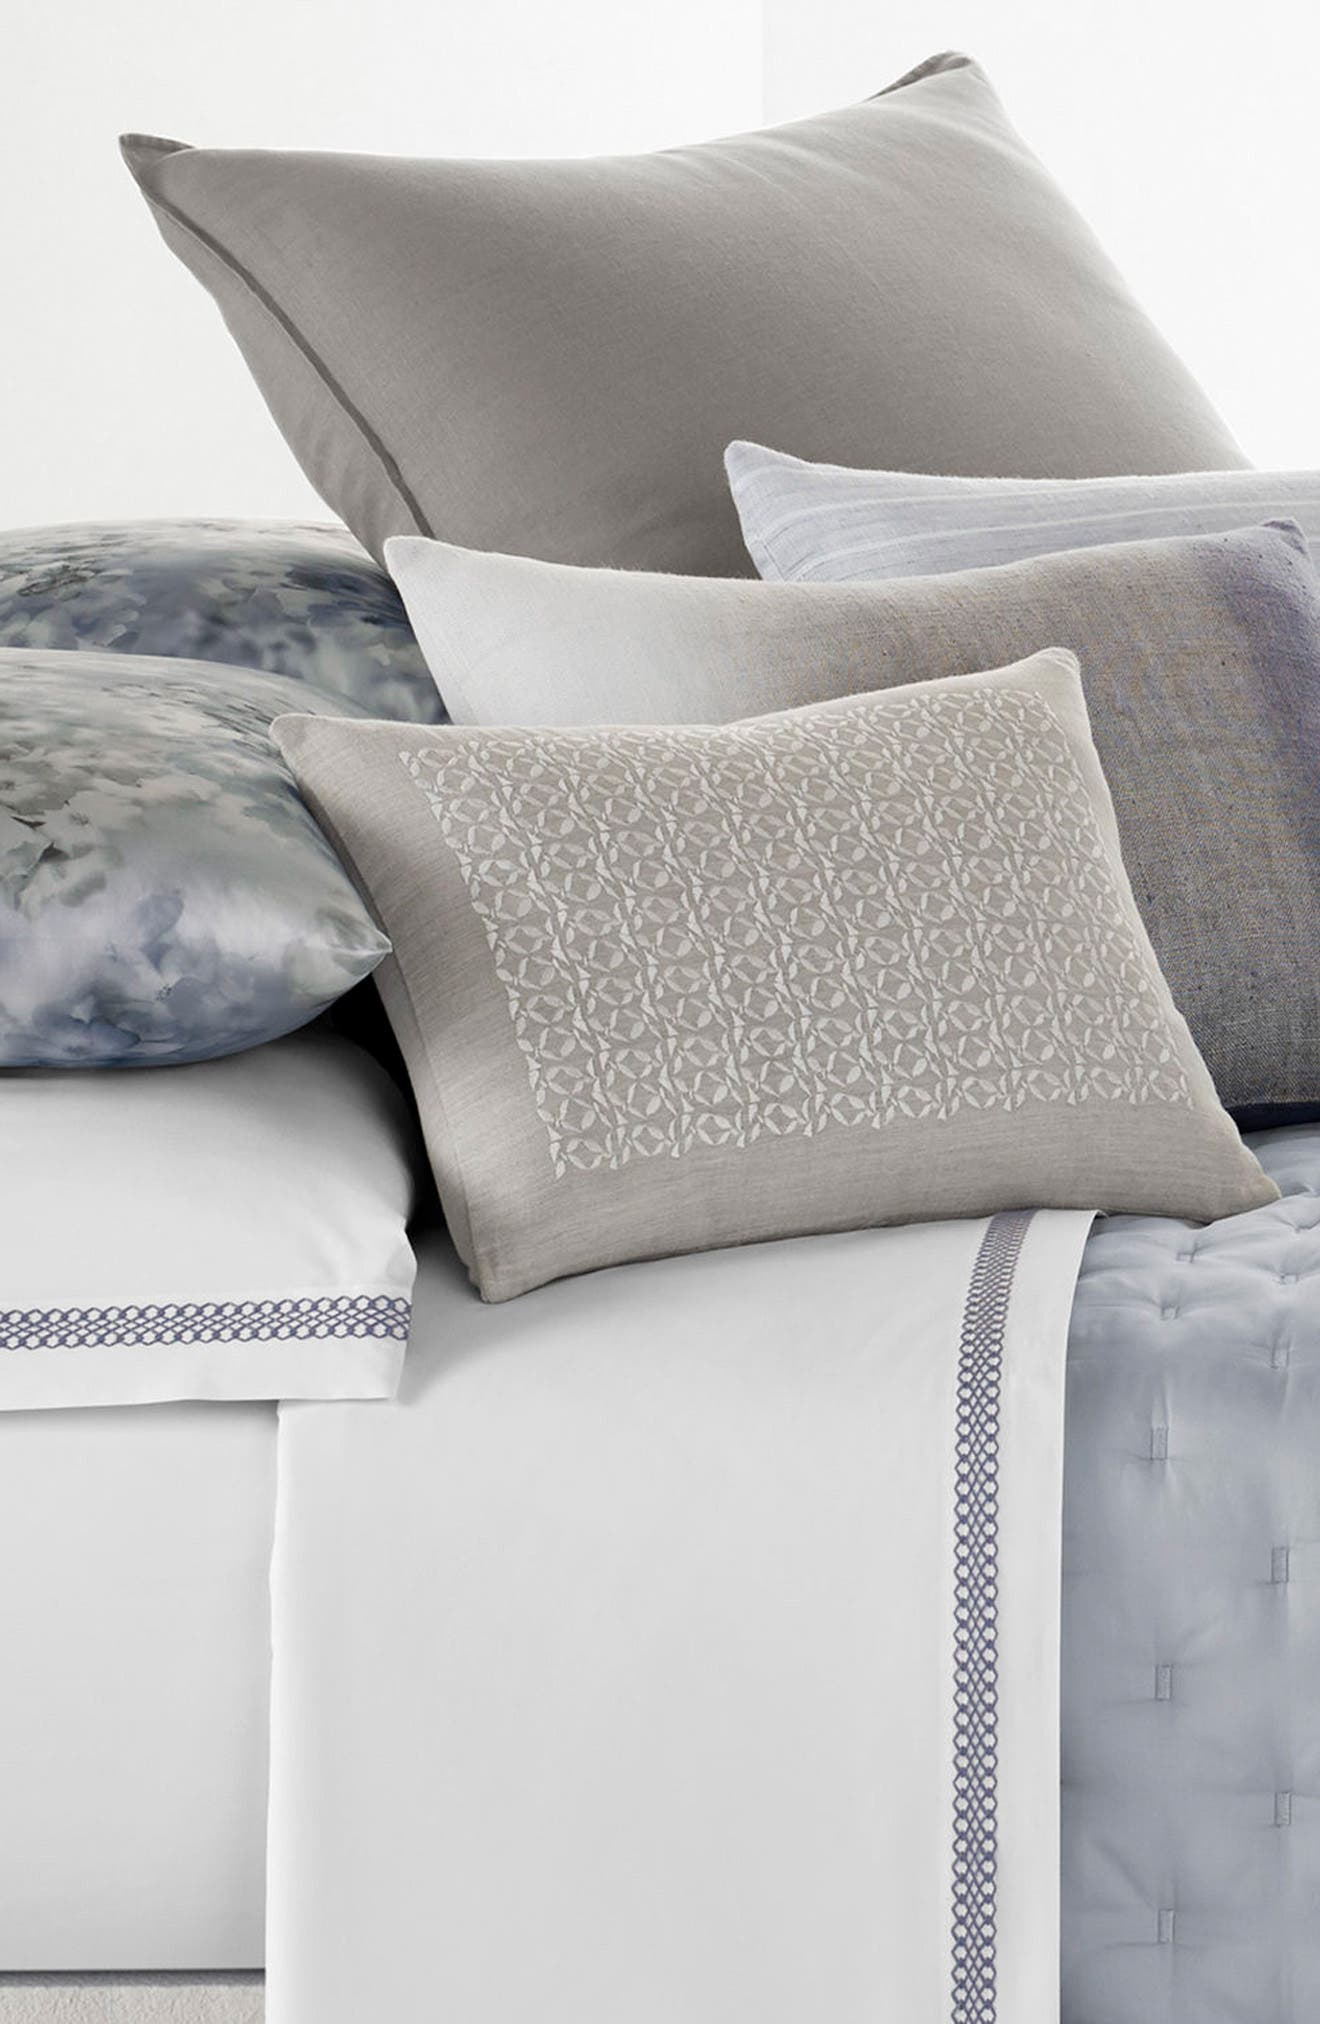 Veiled Bouquet Breakfast Accent Pillow,                             Alternate thumbnail 2, color,                             Light Grey